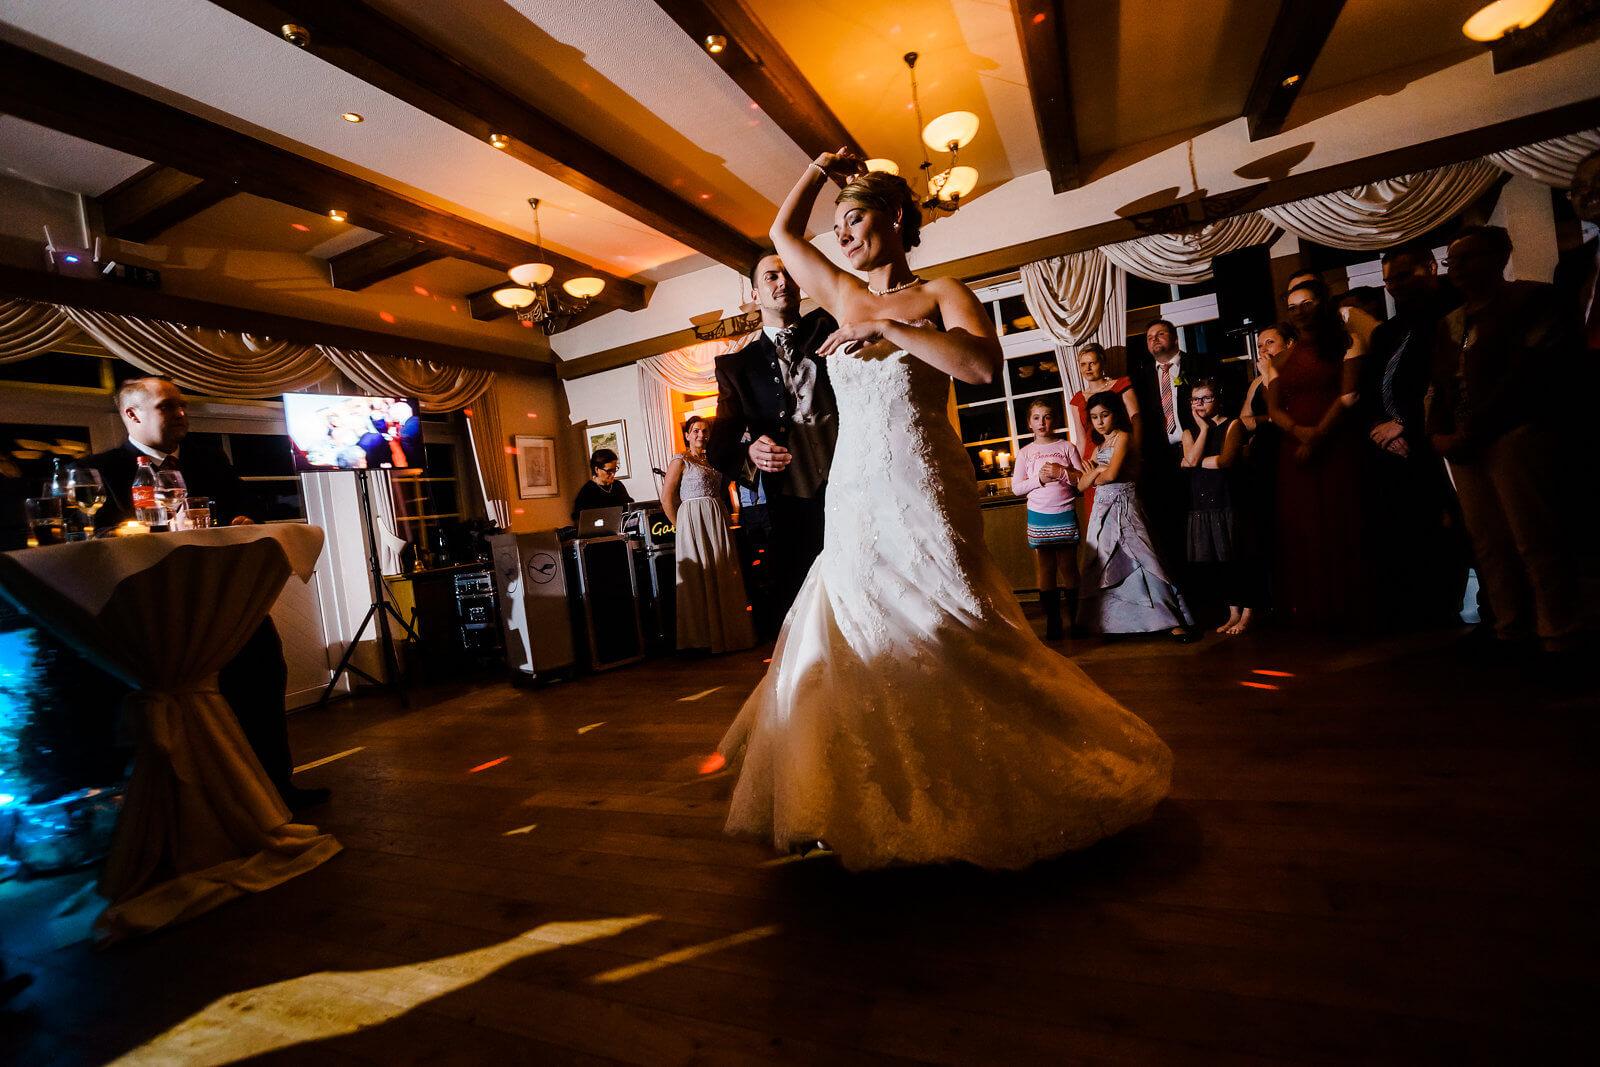 Tanzpaar Tanzfläche Hof Sudermühlen Brautpaar Fotografie